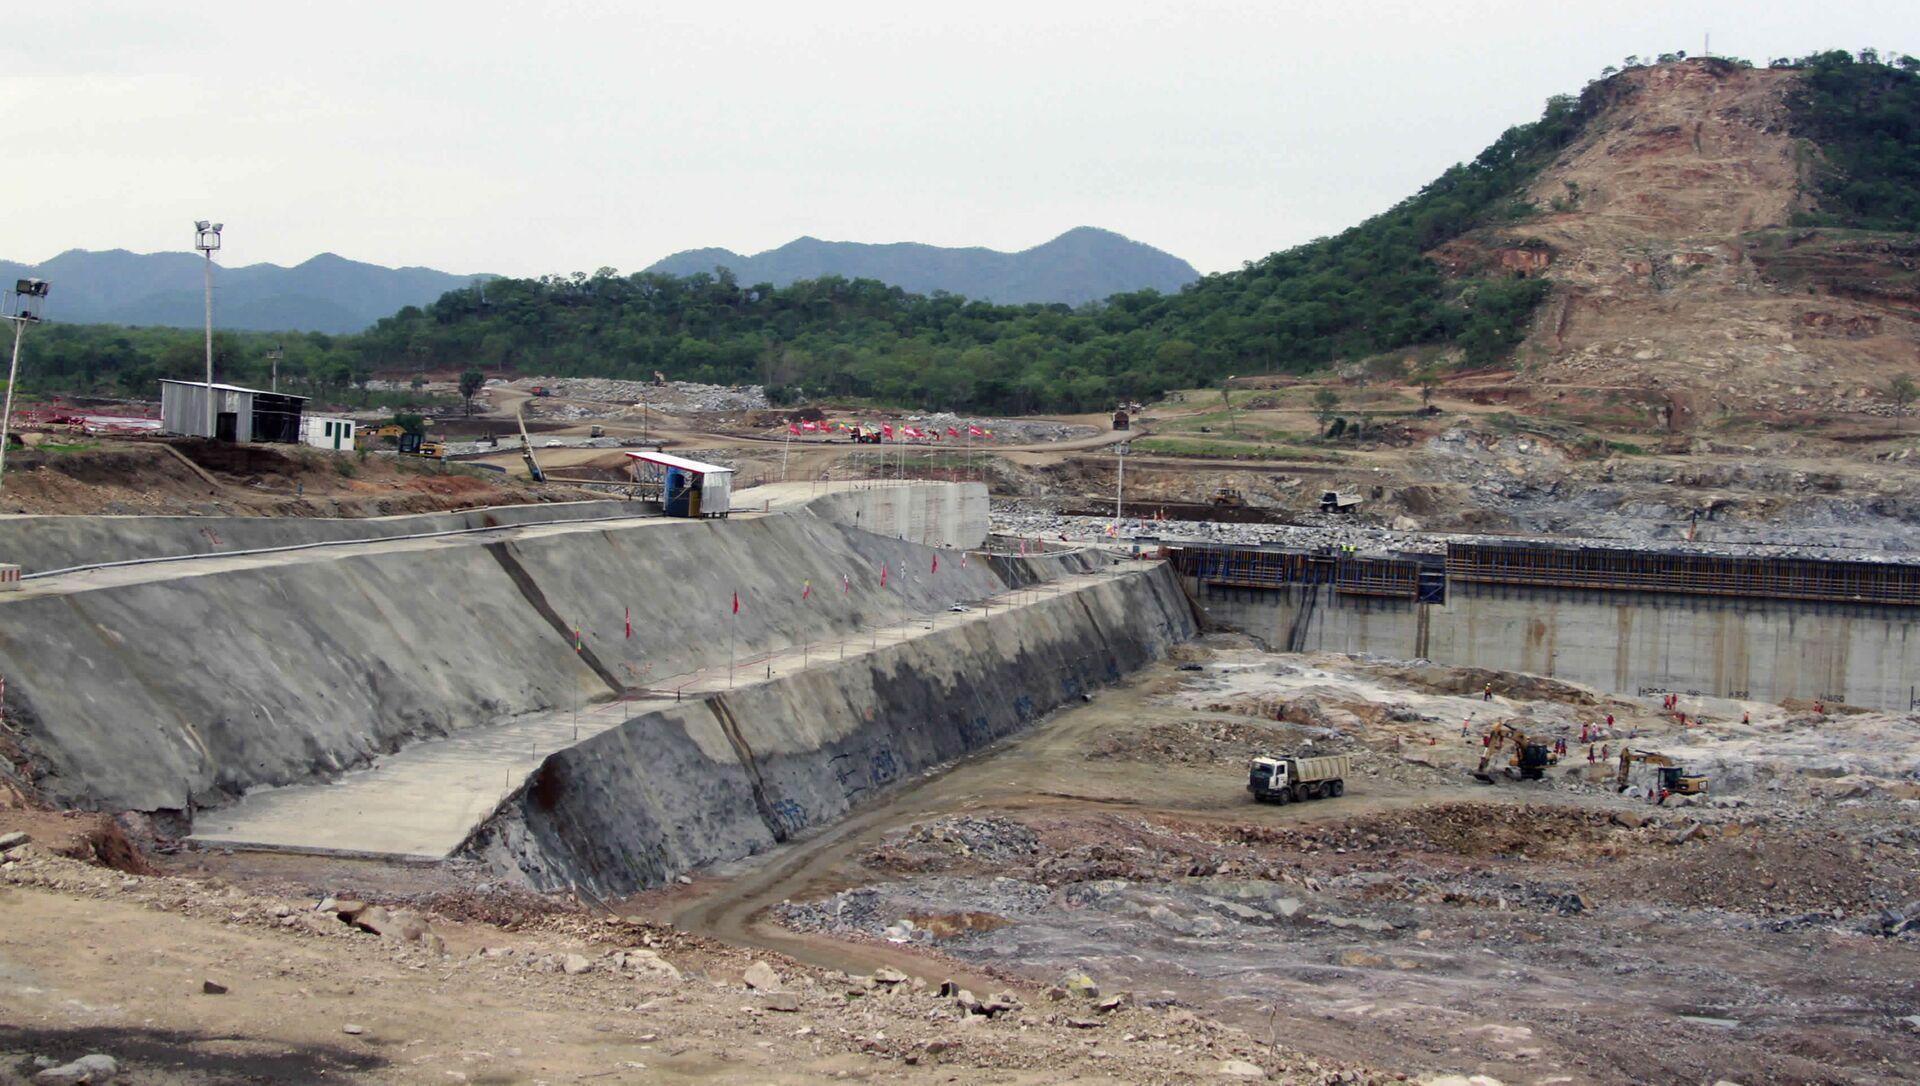 Construction work takes place, at the site of the Grand Ethiopian Renaissance Dam near Assosa, Ethiopia - Sputnik International, 1920, 27.07.2021